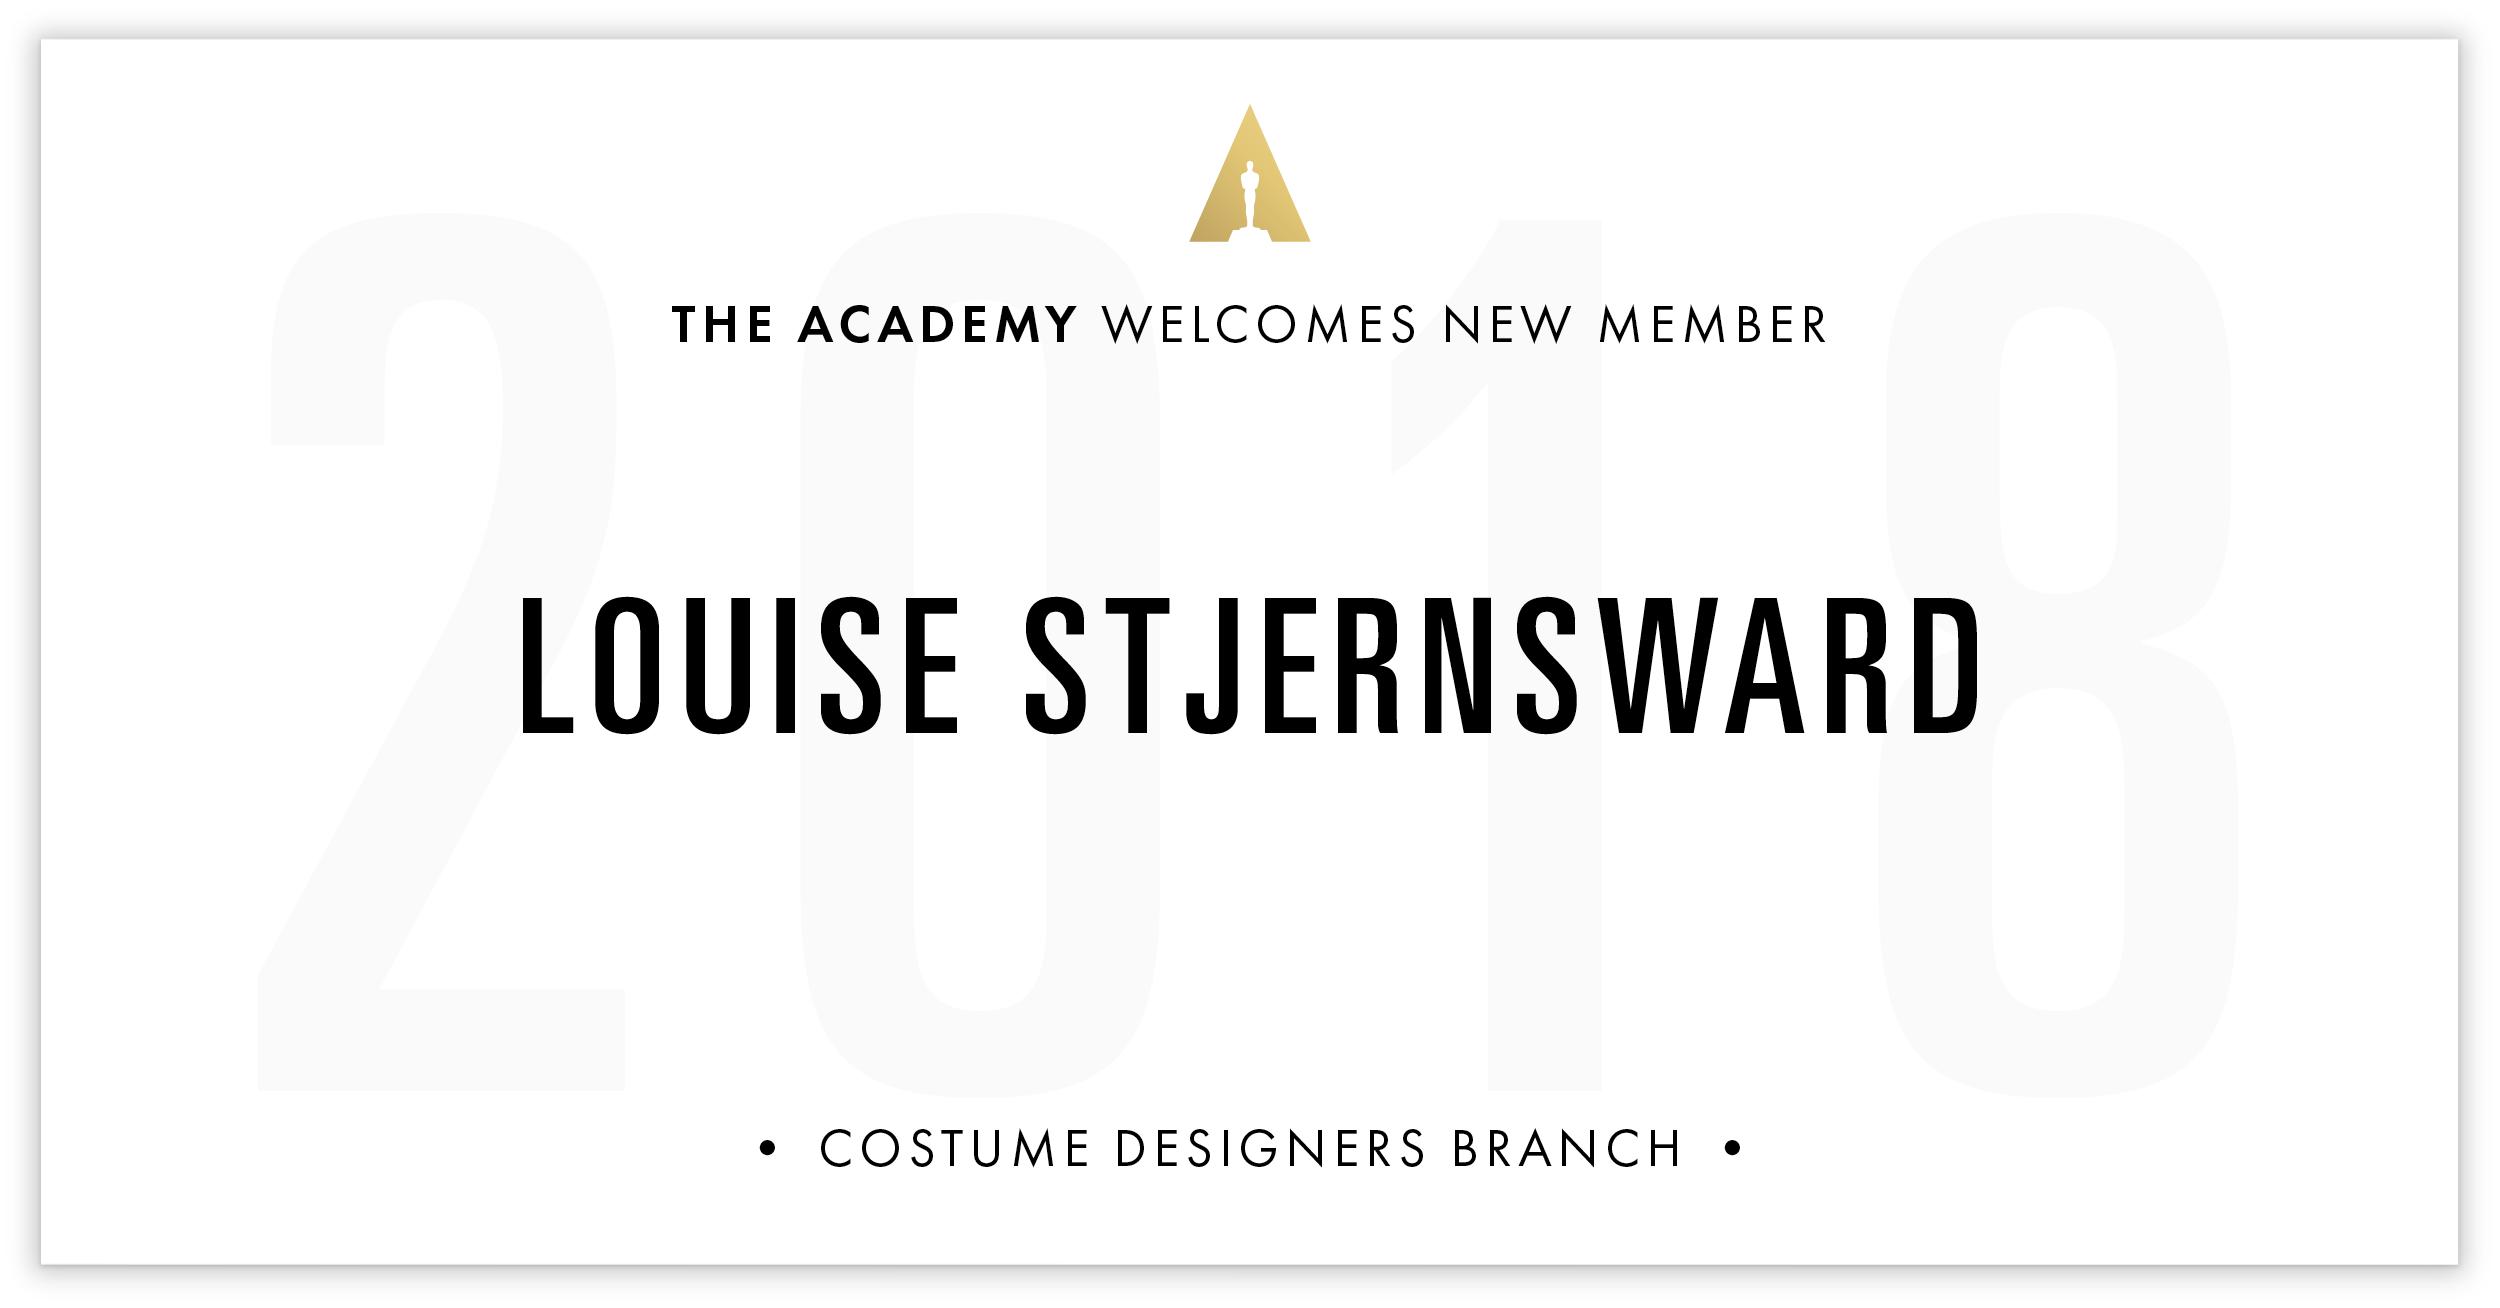 Louise Stjernsward is invited!